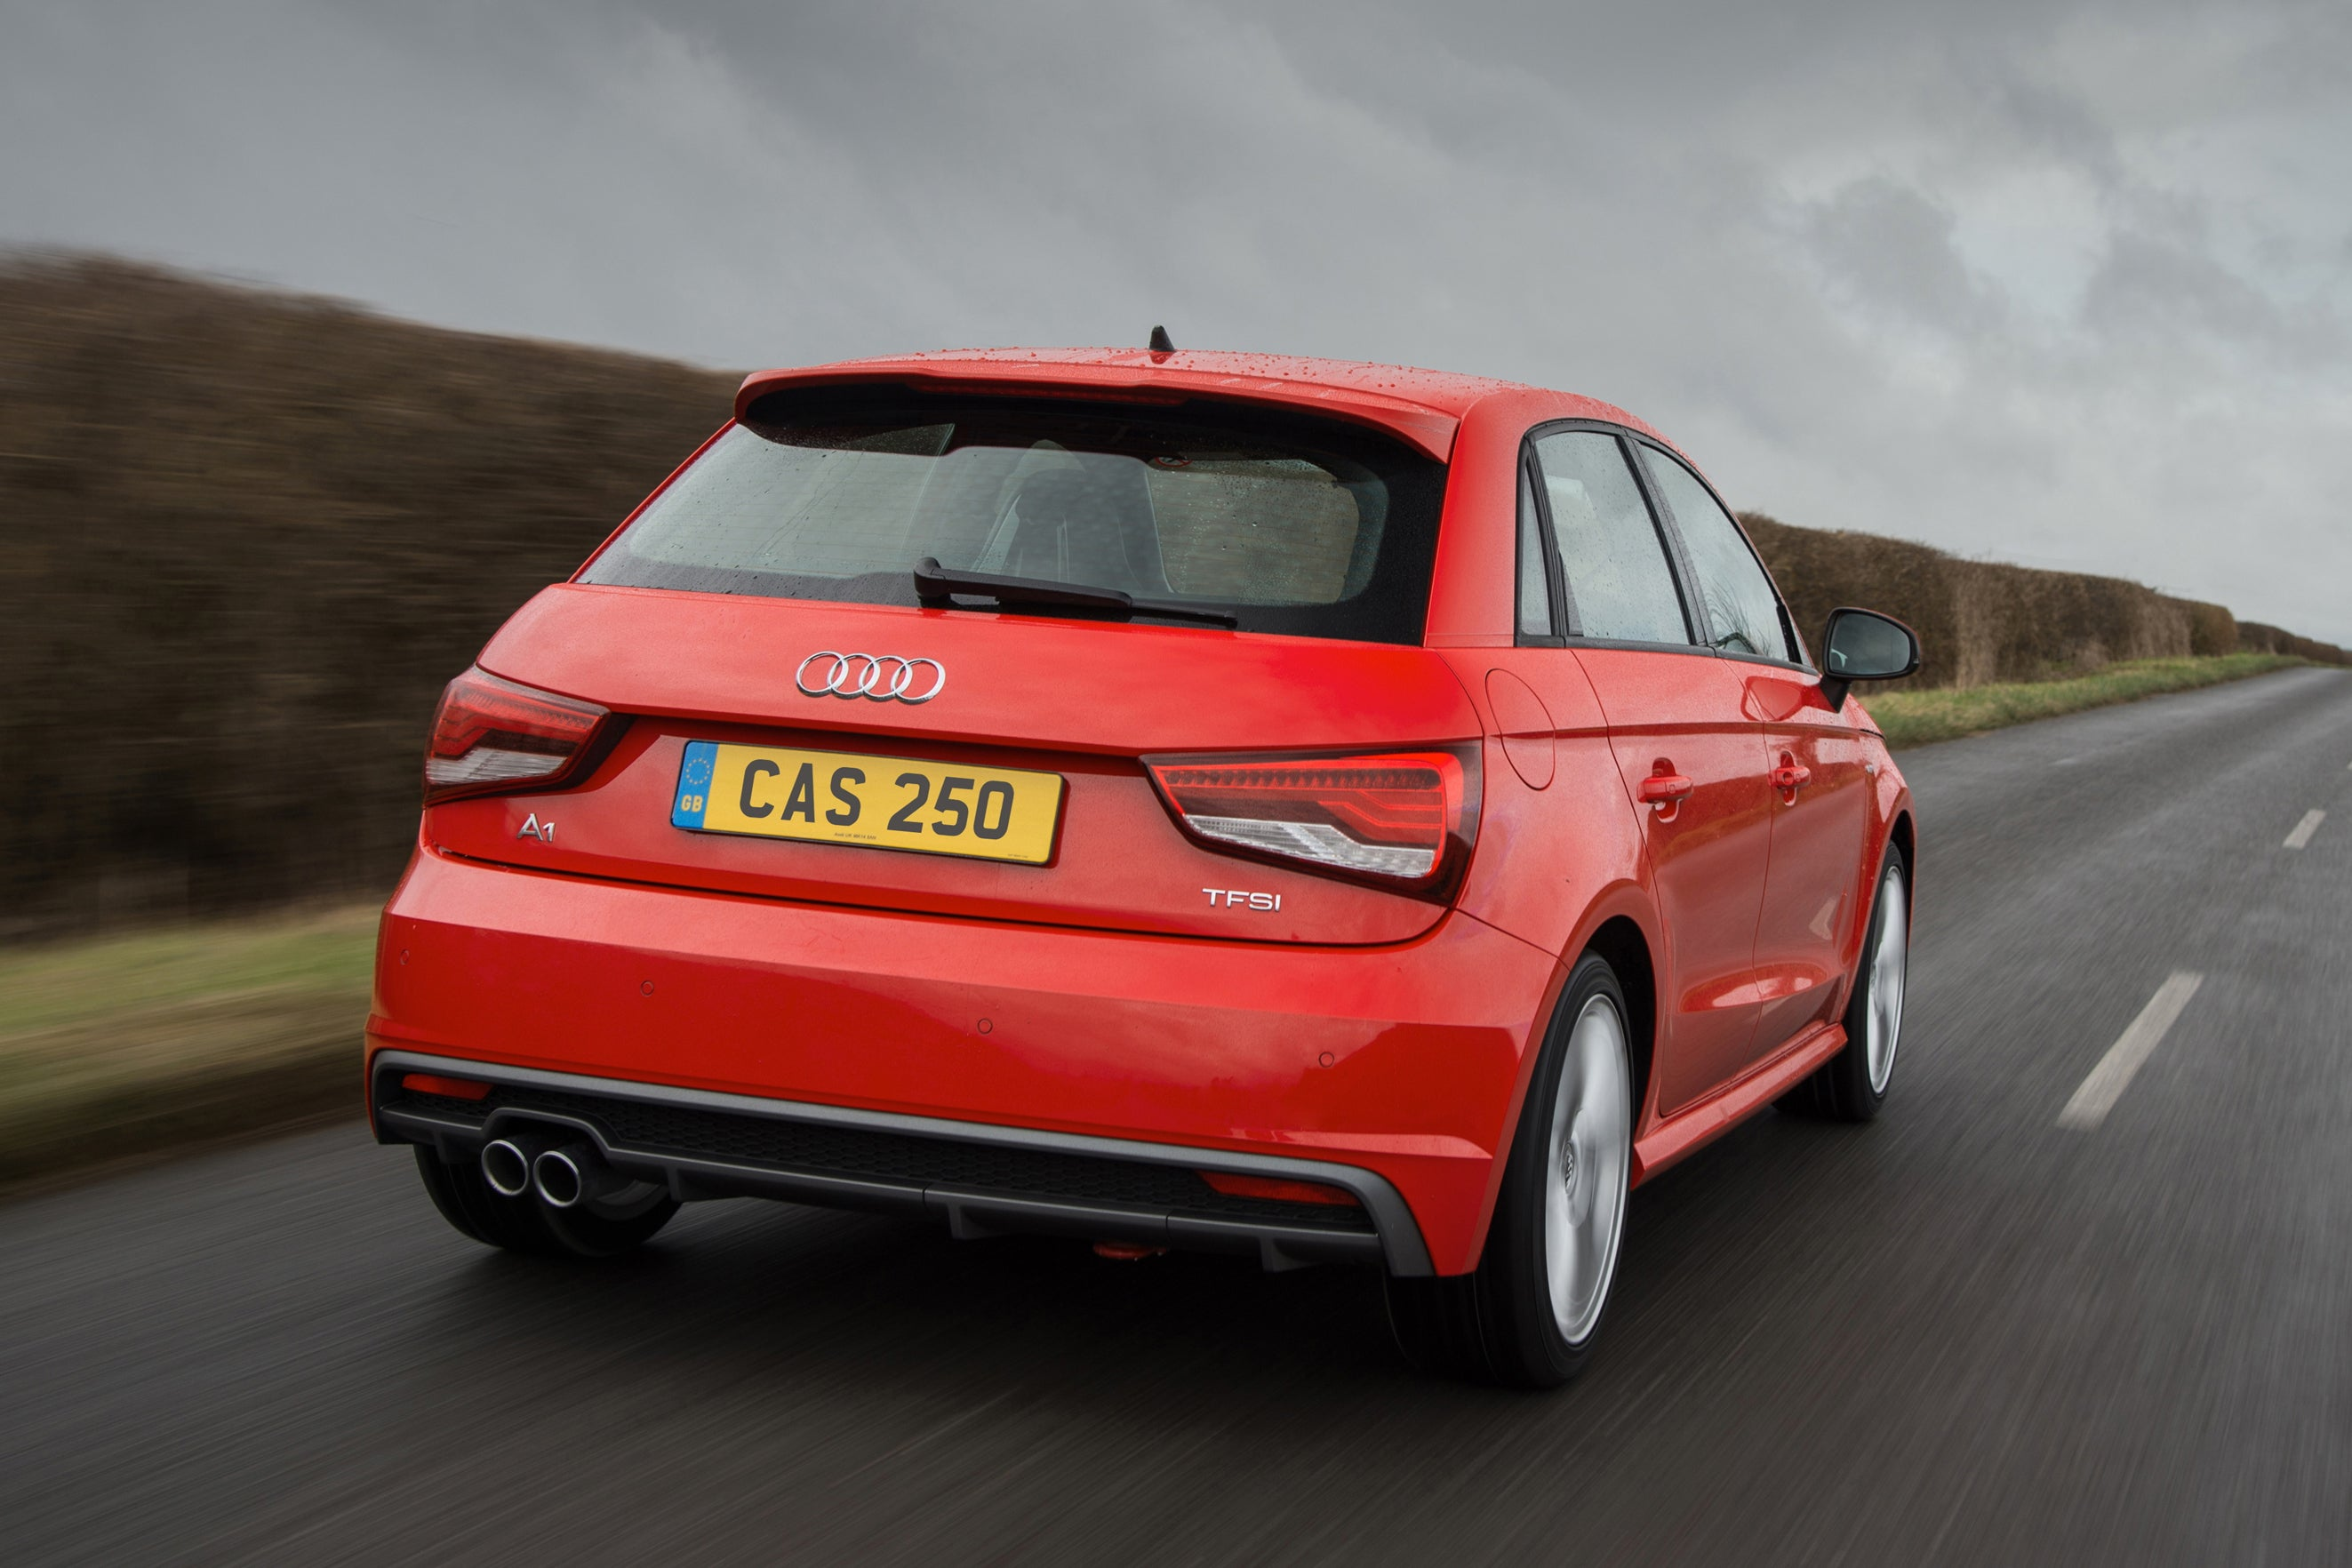 Audi A1 Sportback Driving Back